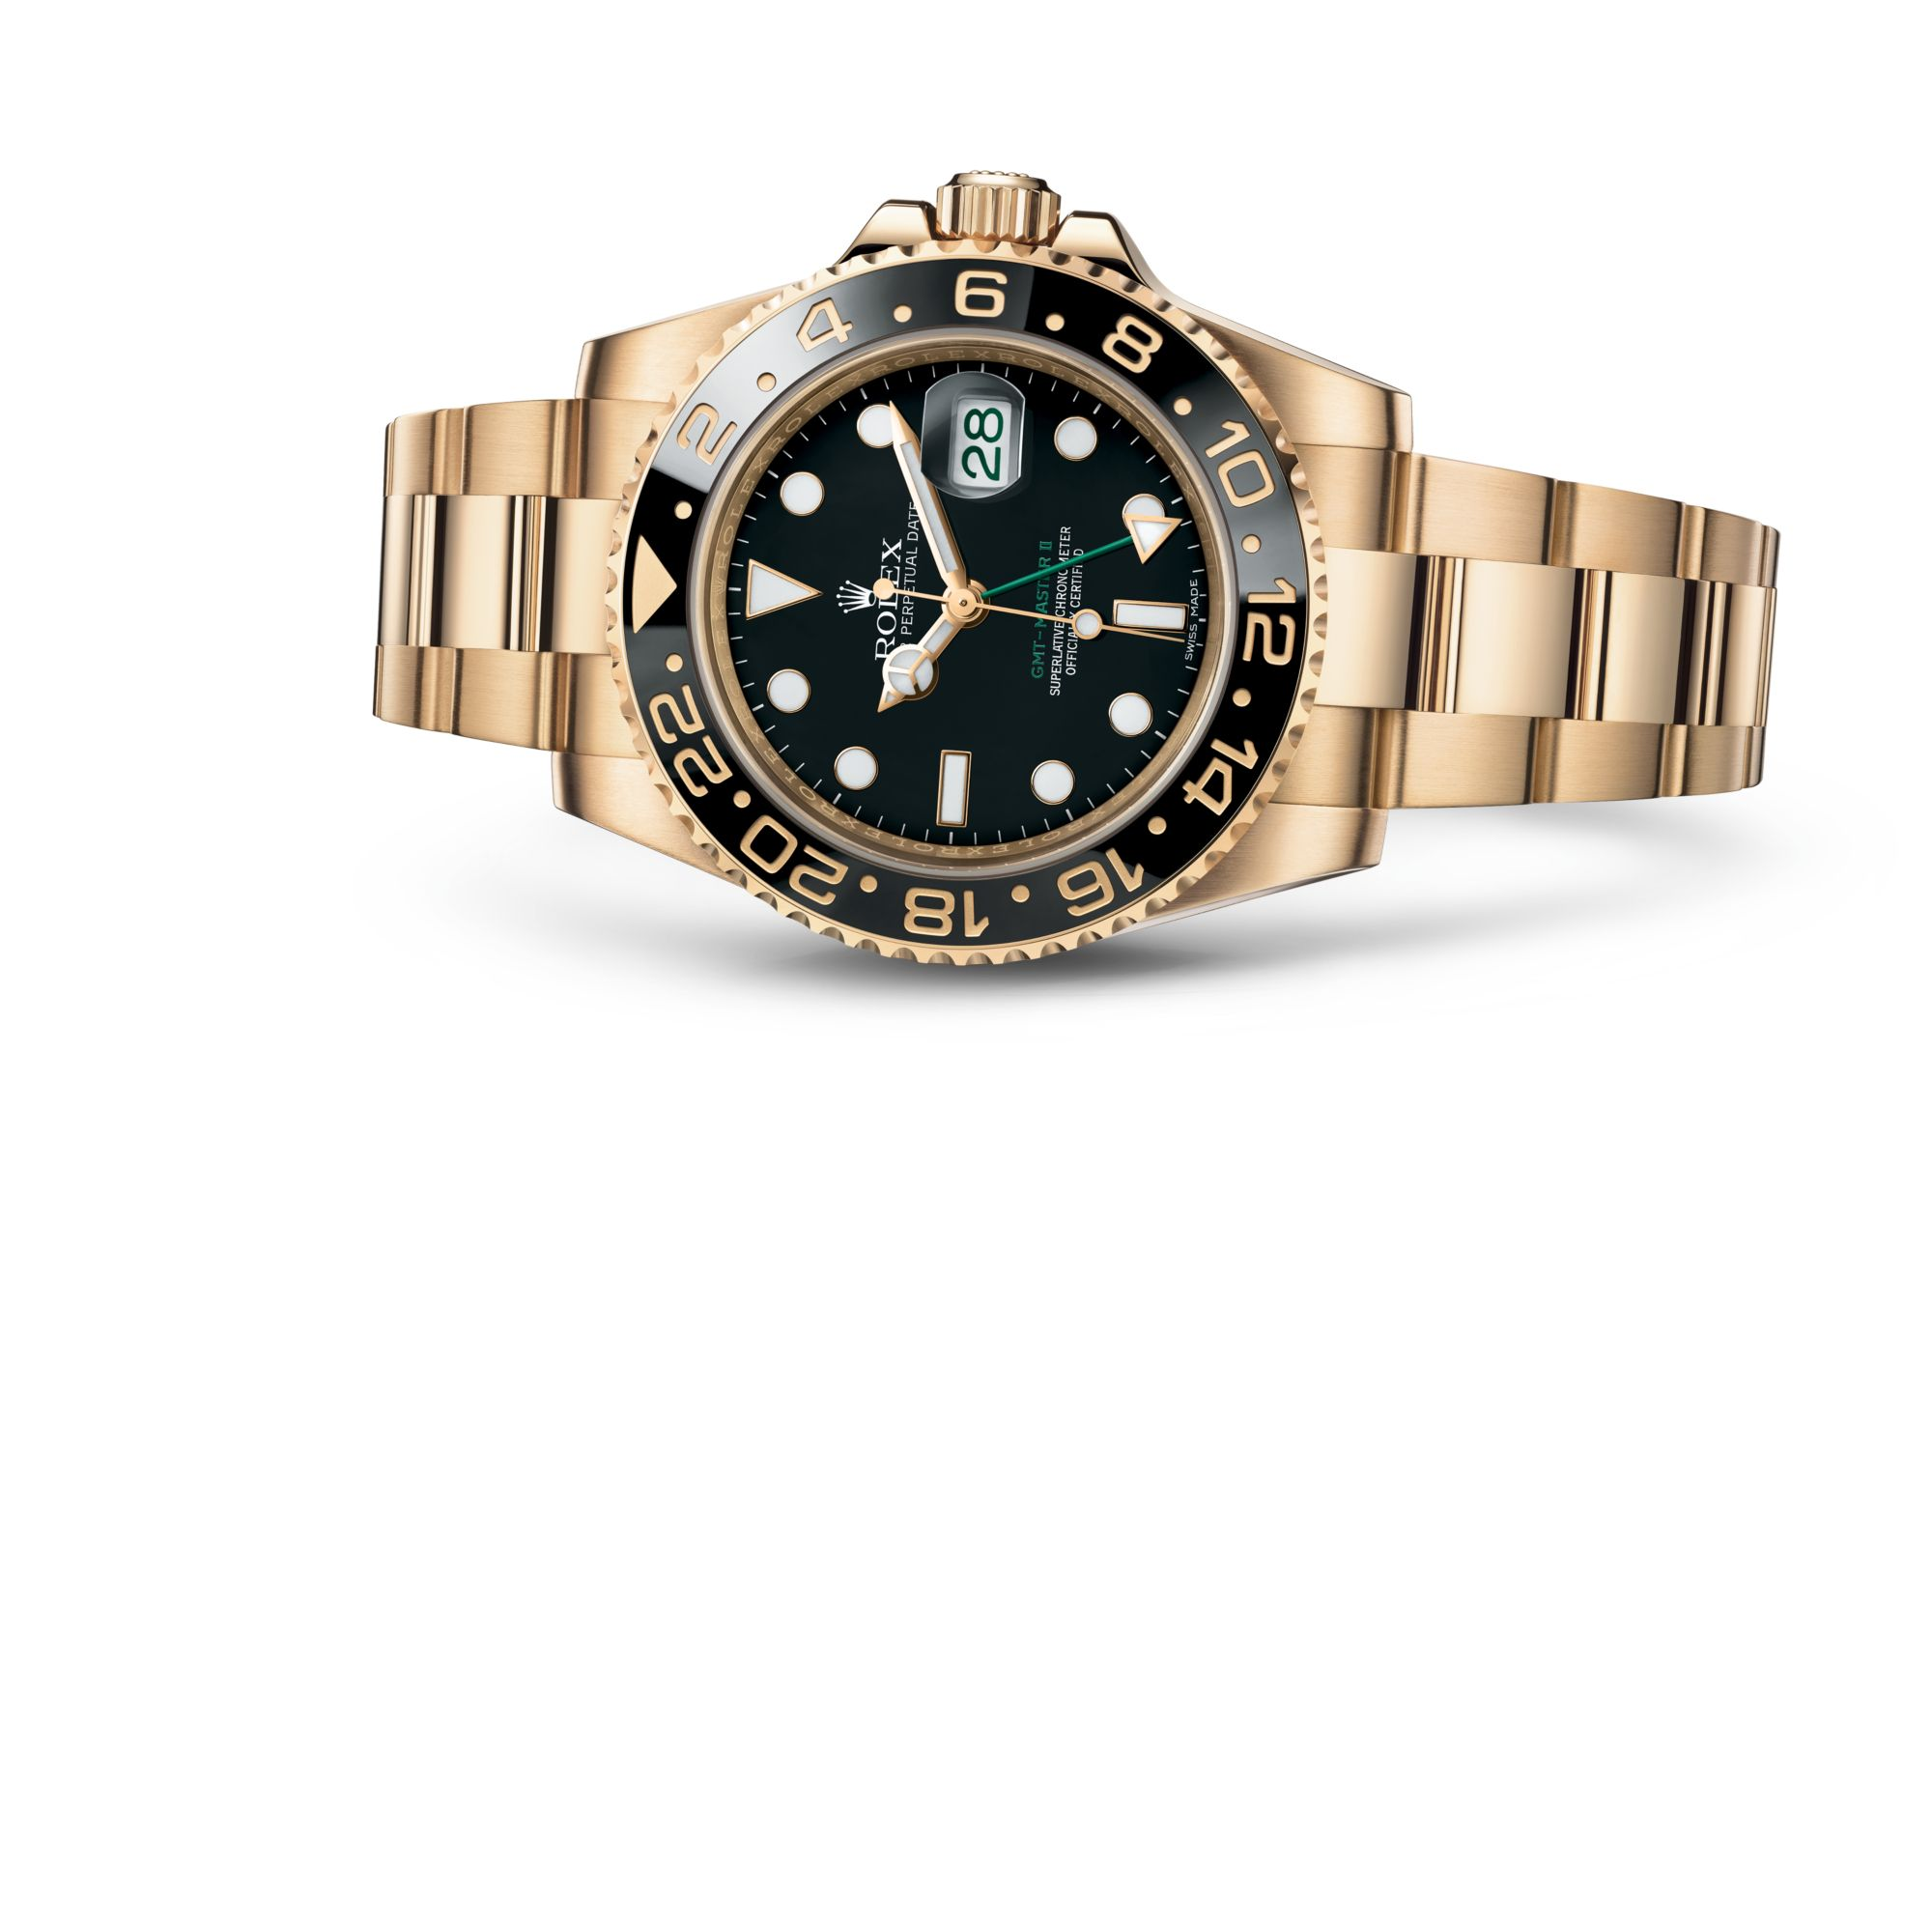 Rolex GMT-Master II M116718LN-0001